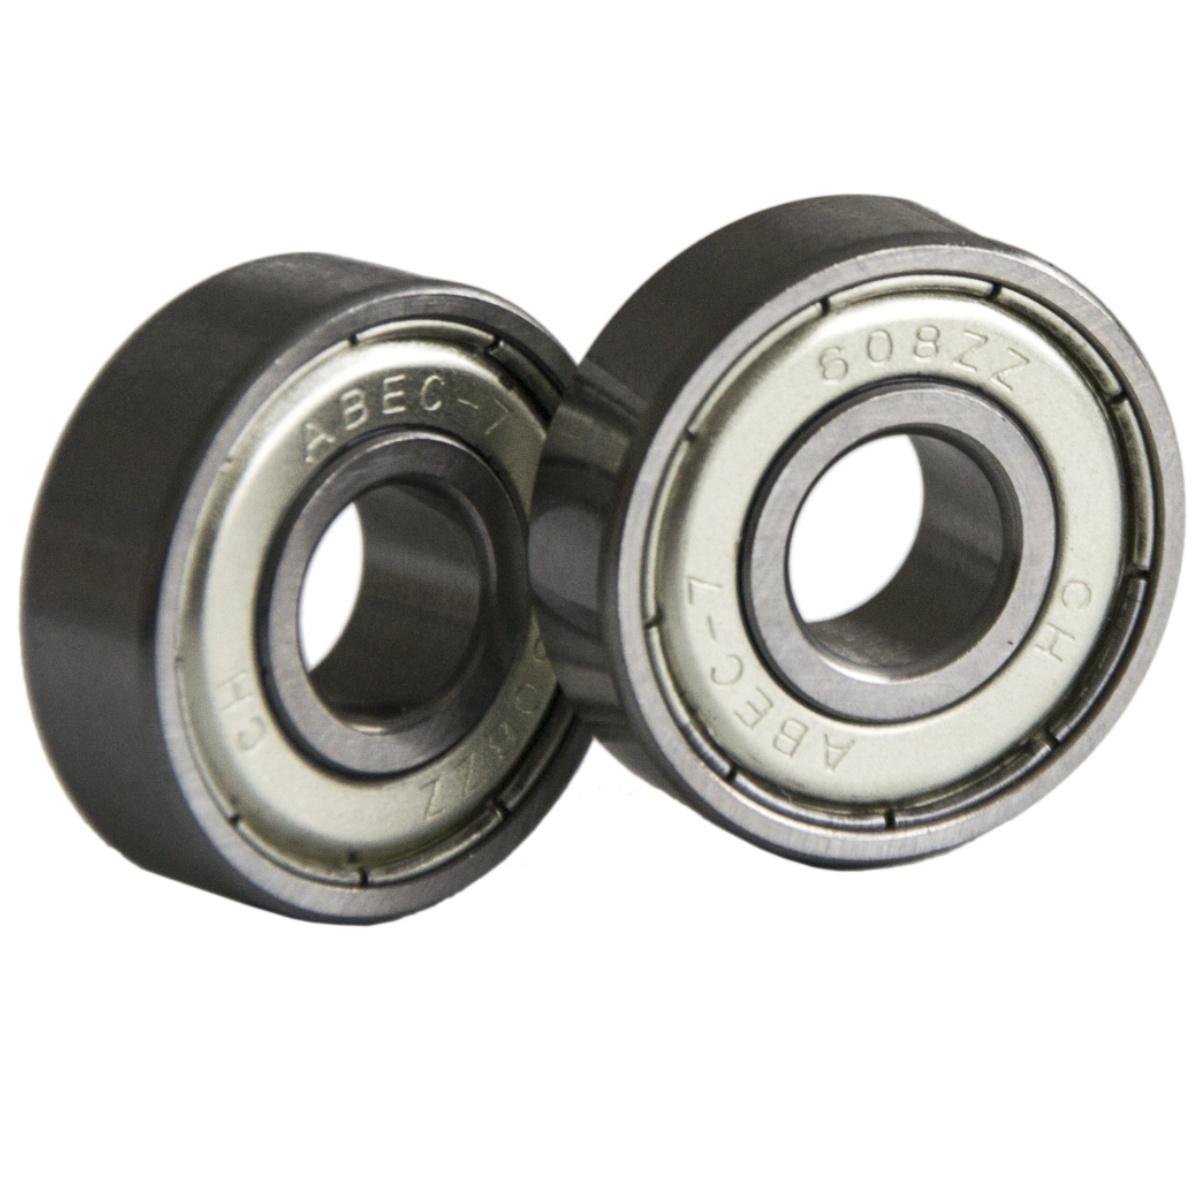 Ložiska NILS ABEC 7 Chrome steel